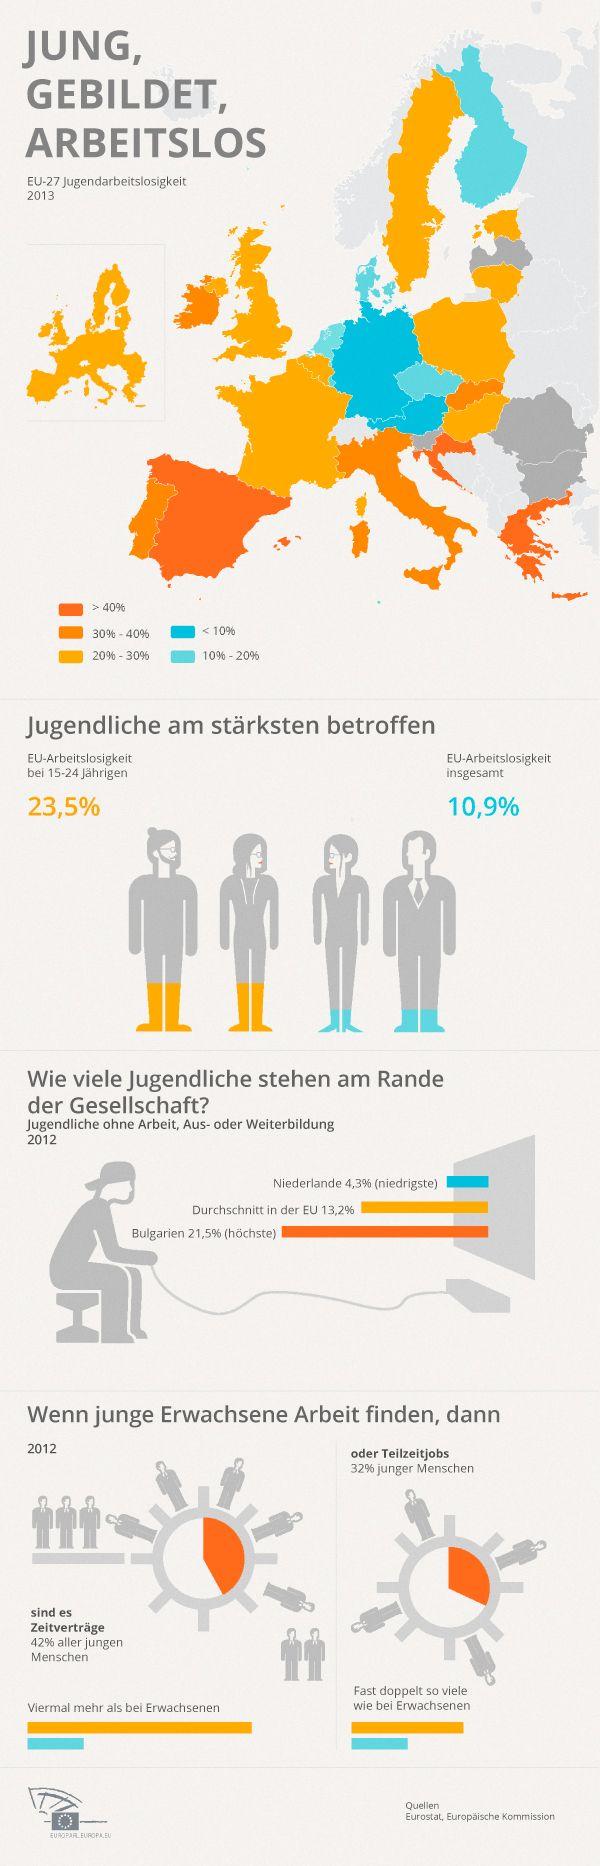 EU-Sozialfonds: Kampf gegen die Jugendarbeitslosigkeit (Infografik)